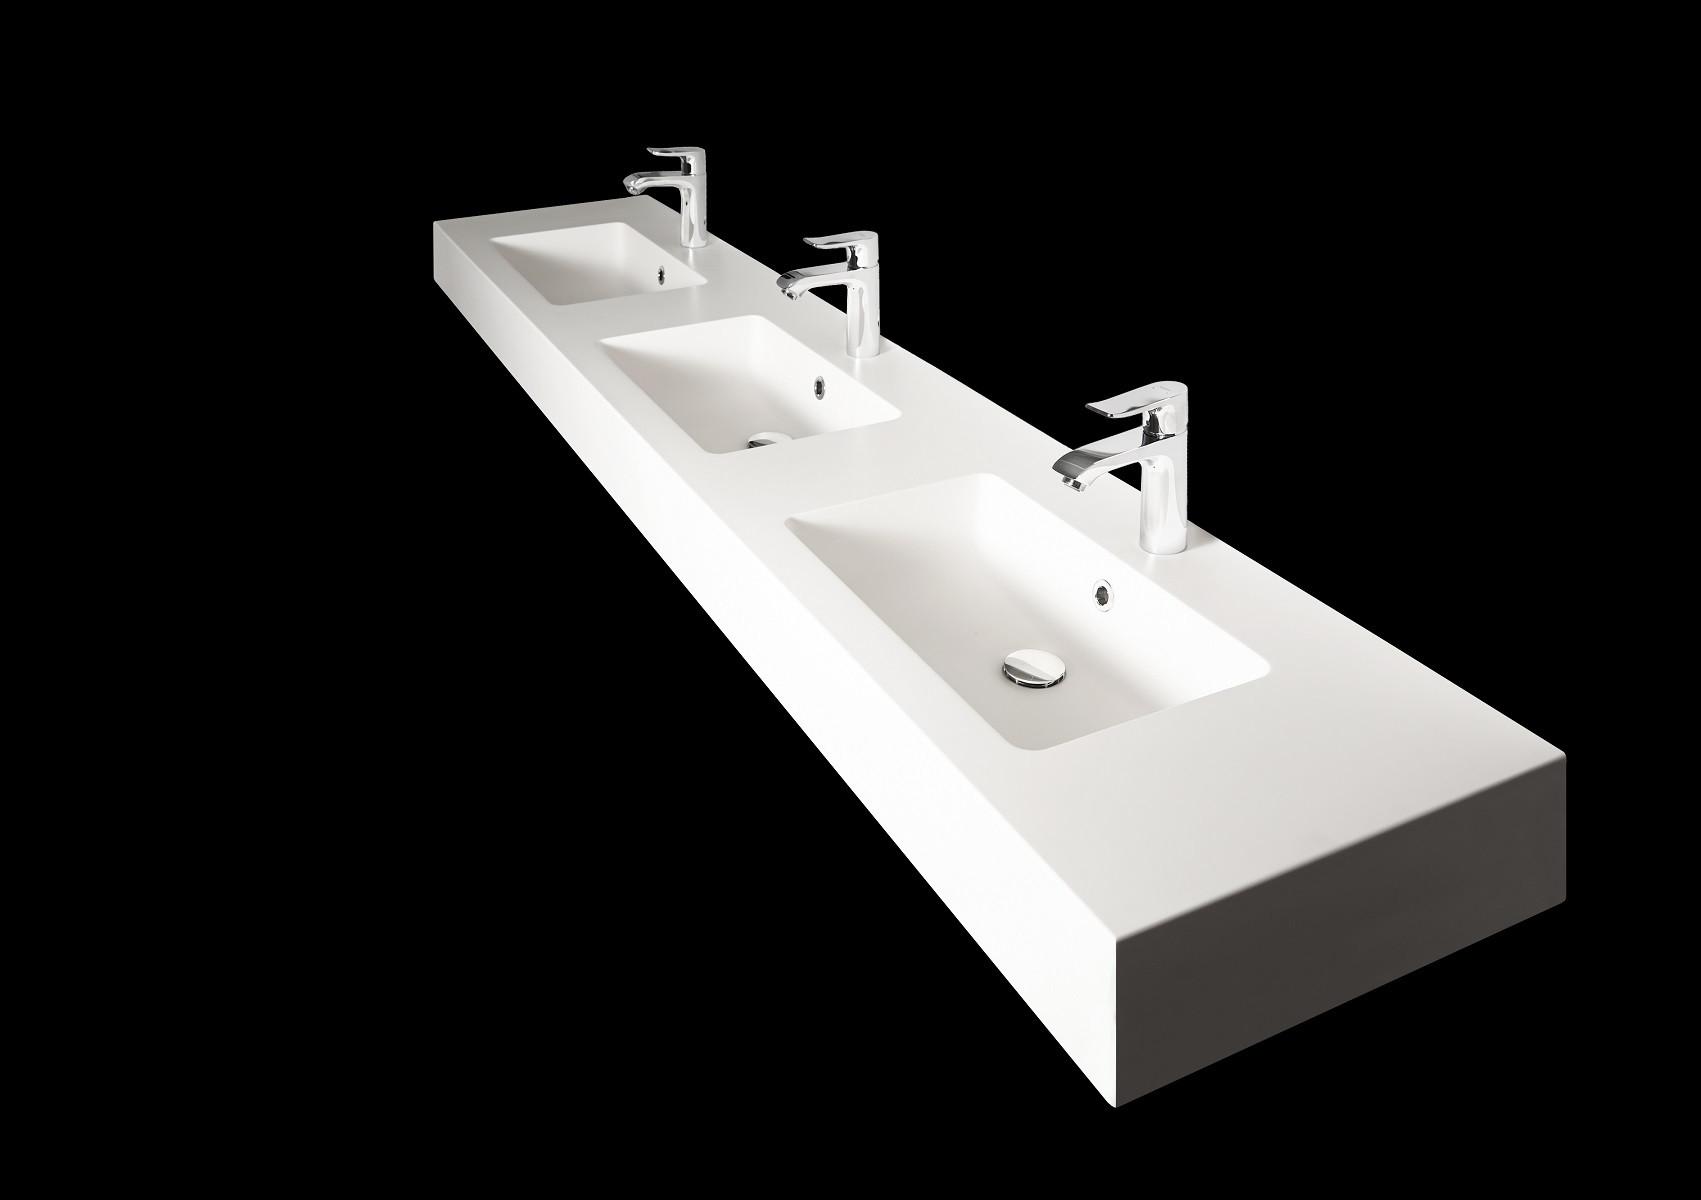 Aquatica Lantana-С-Wht Stone Bathroom Sink In White With 3 Washbasins